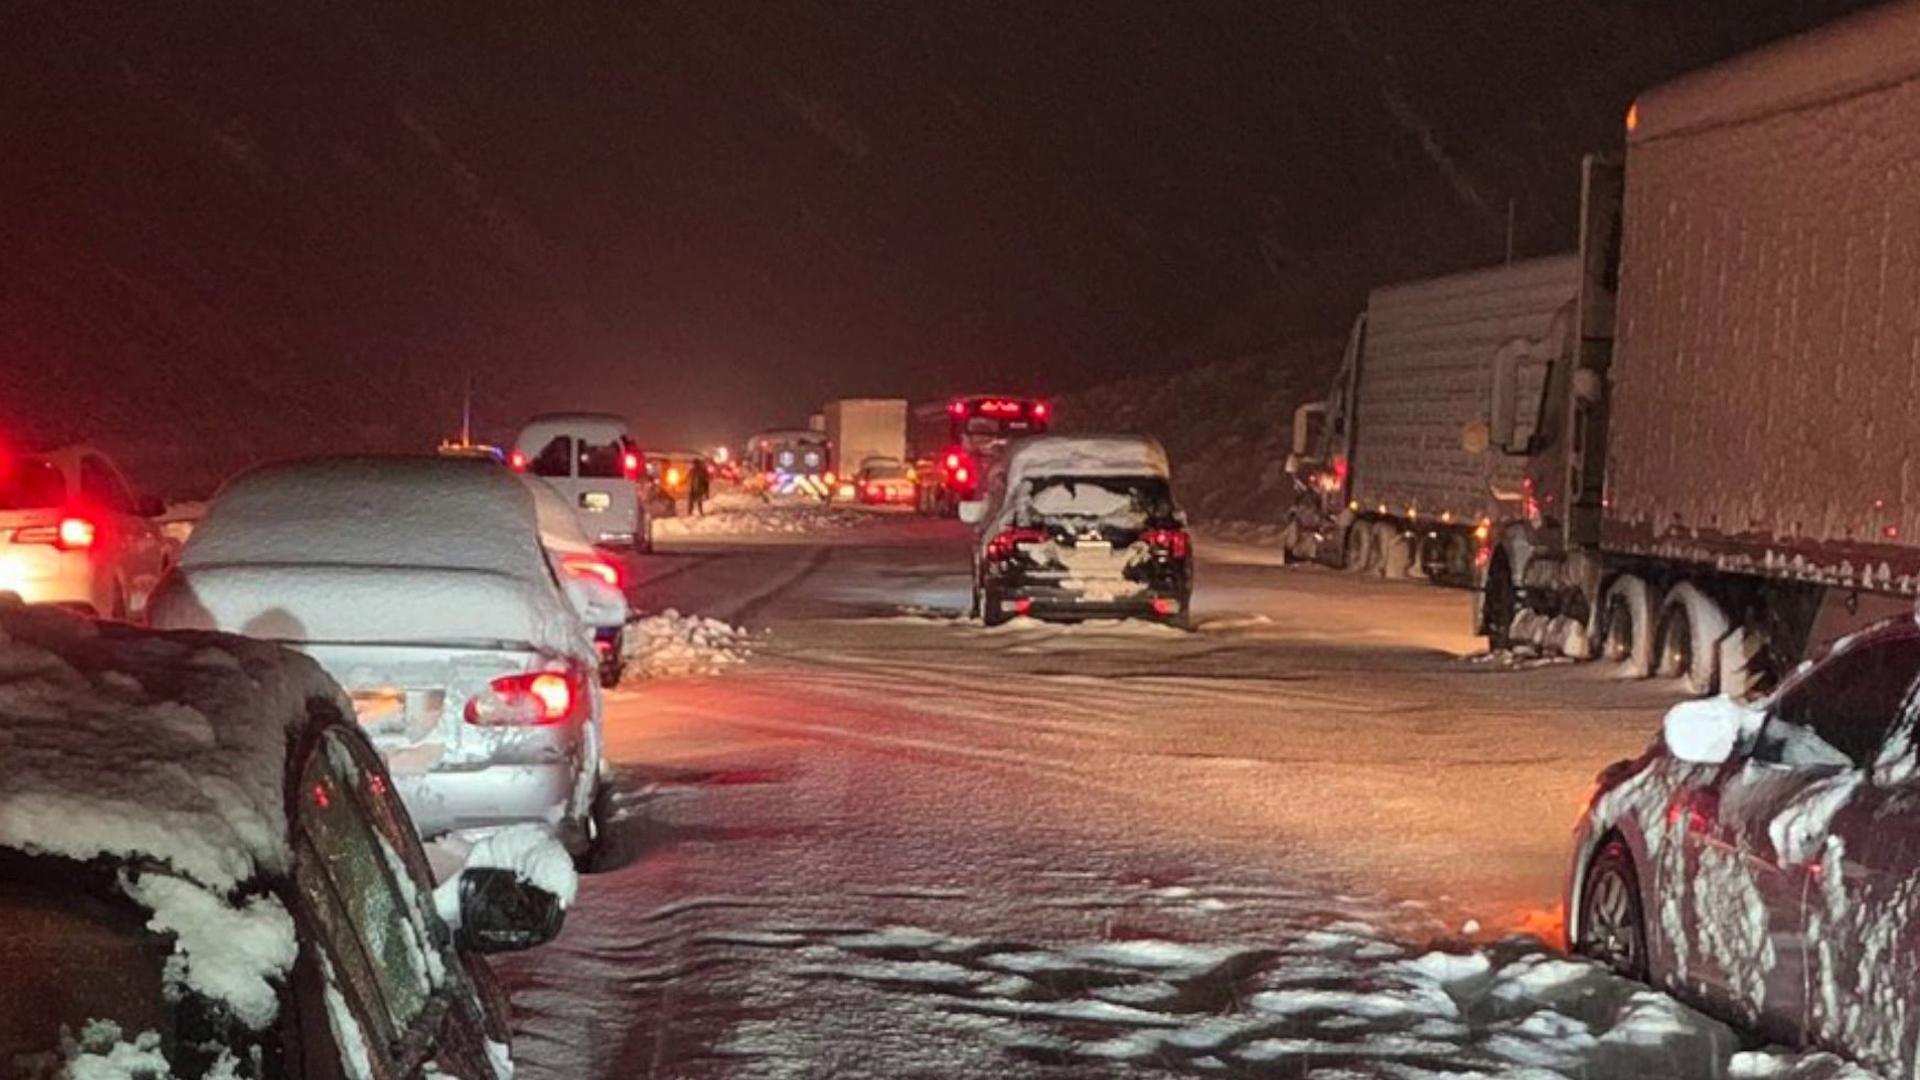 Multiple vehicles were stuck along the Grapevine on Dec. 26, 2019. (Credit: @louigiswla / Twitter)